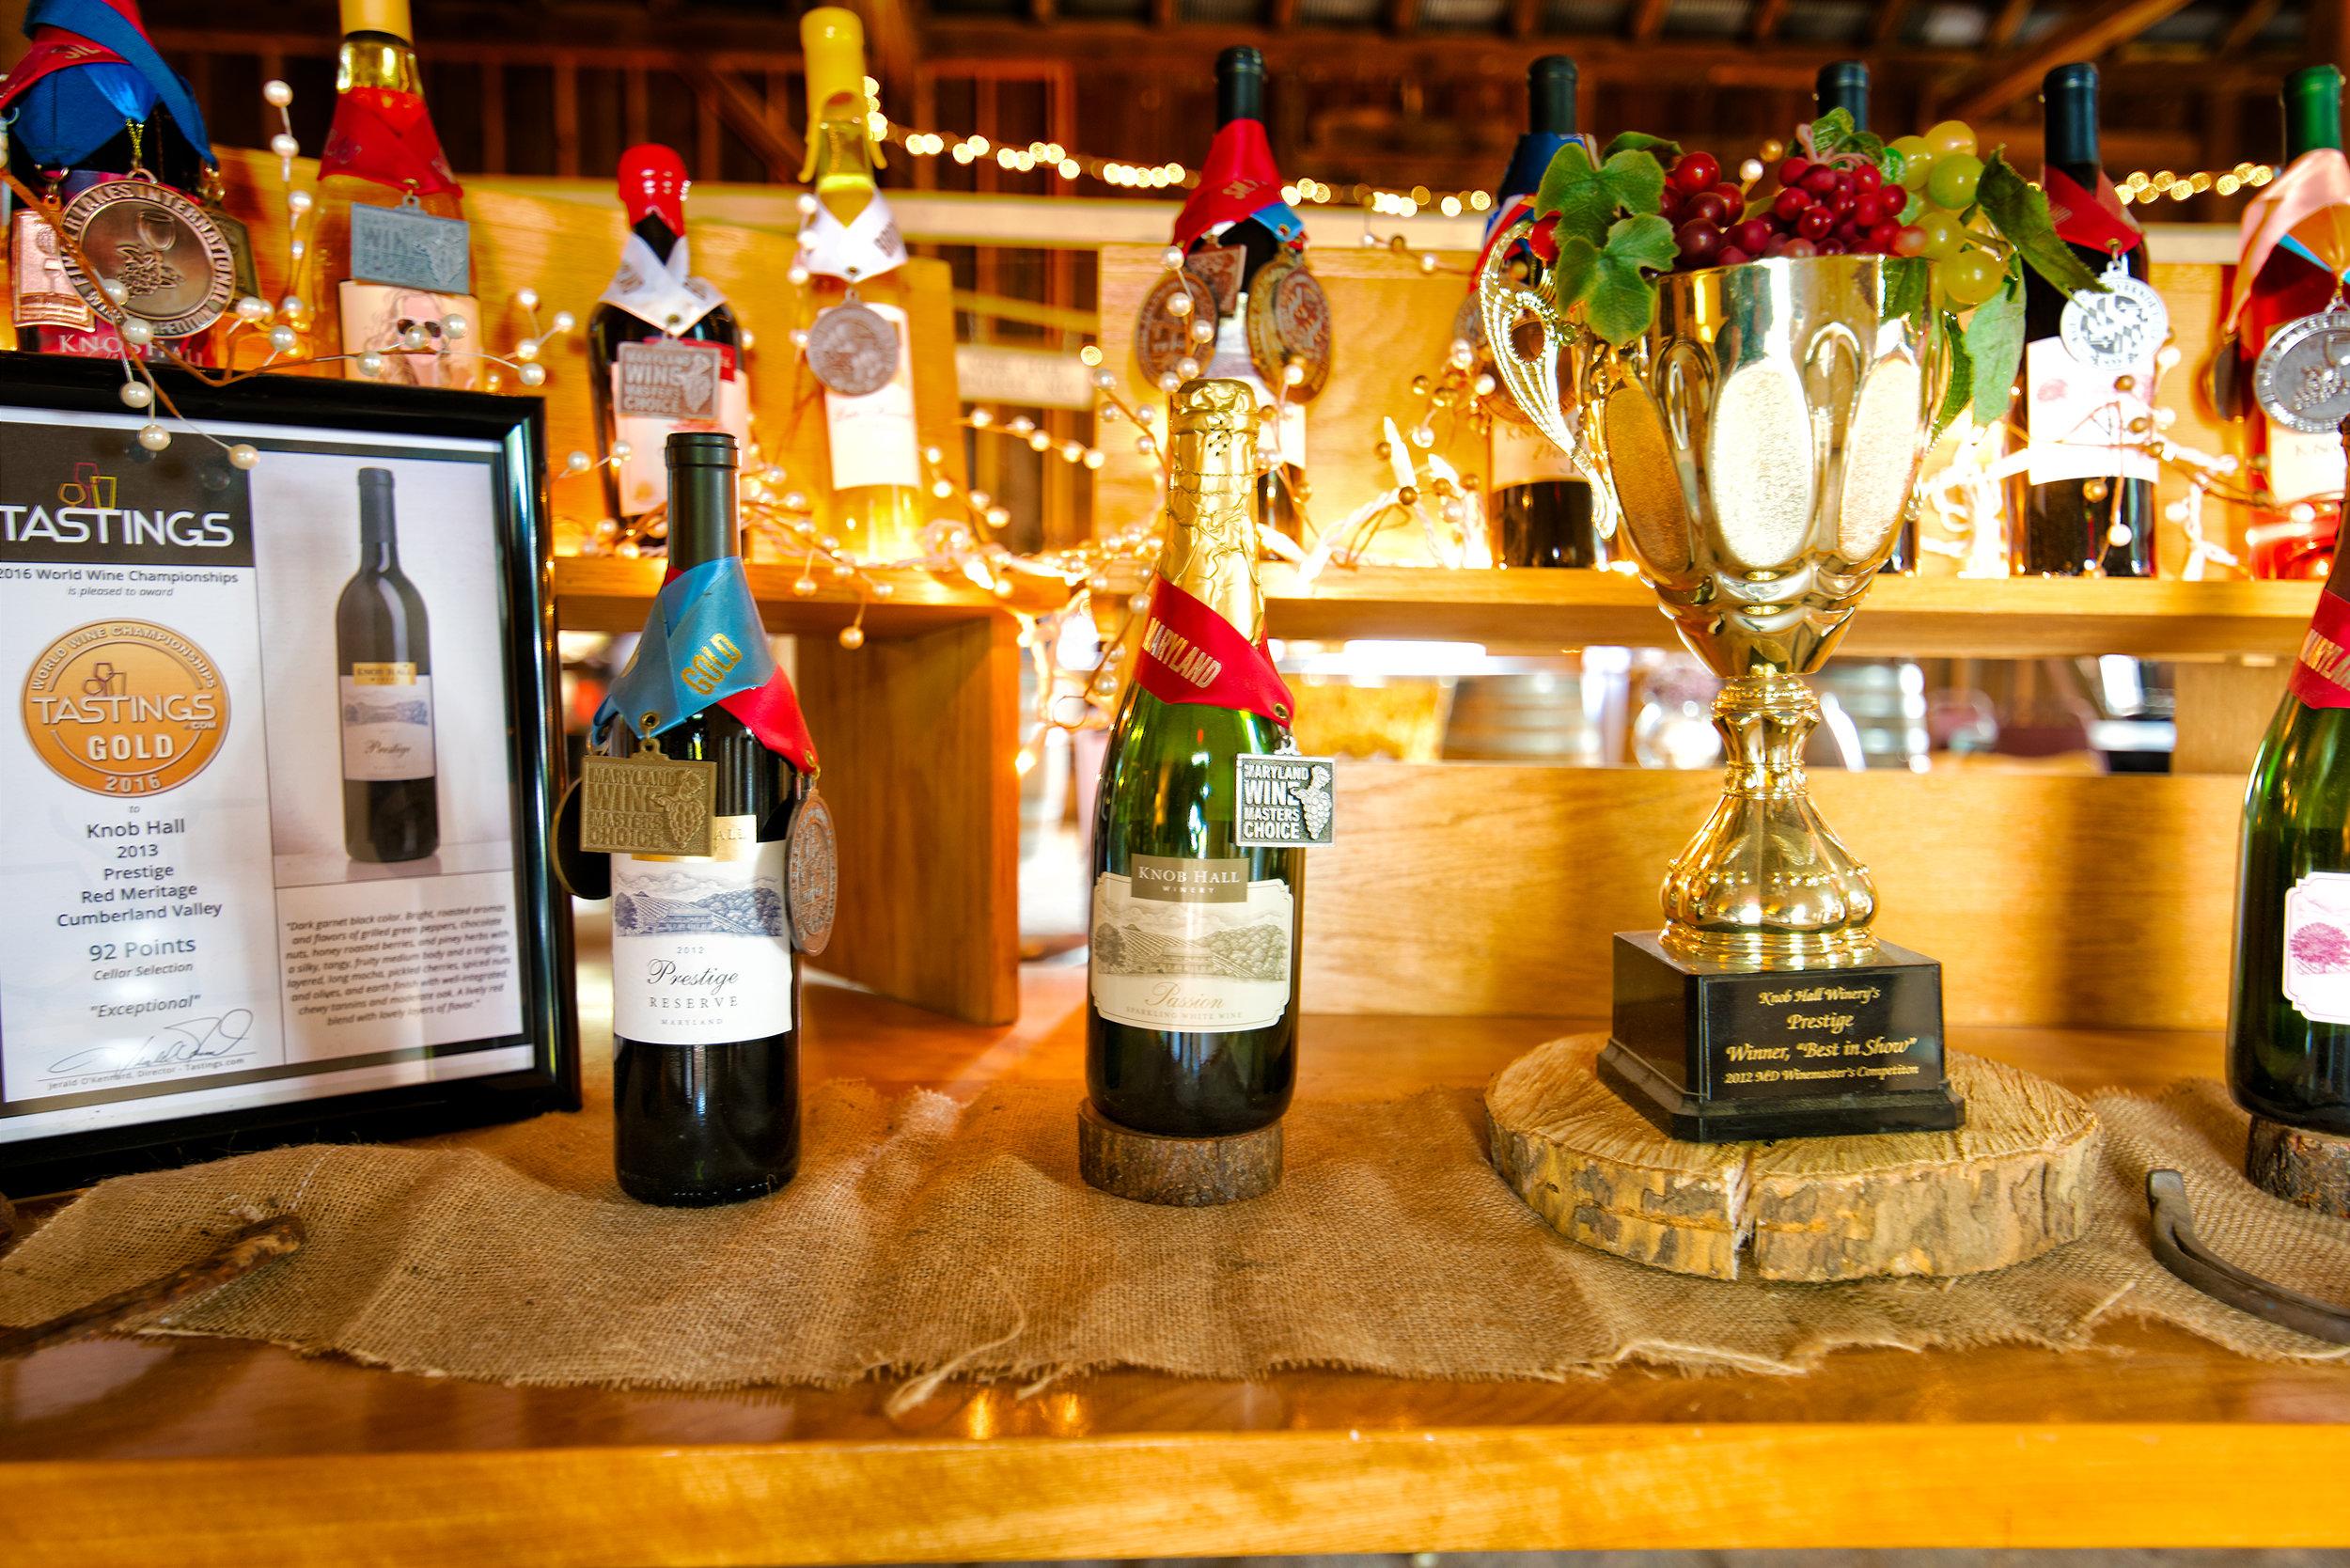 Maryland is producing award wining wines